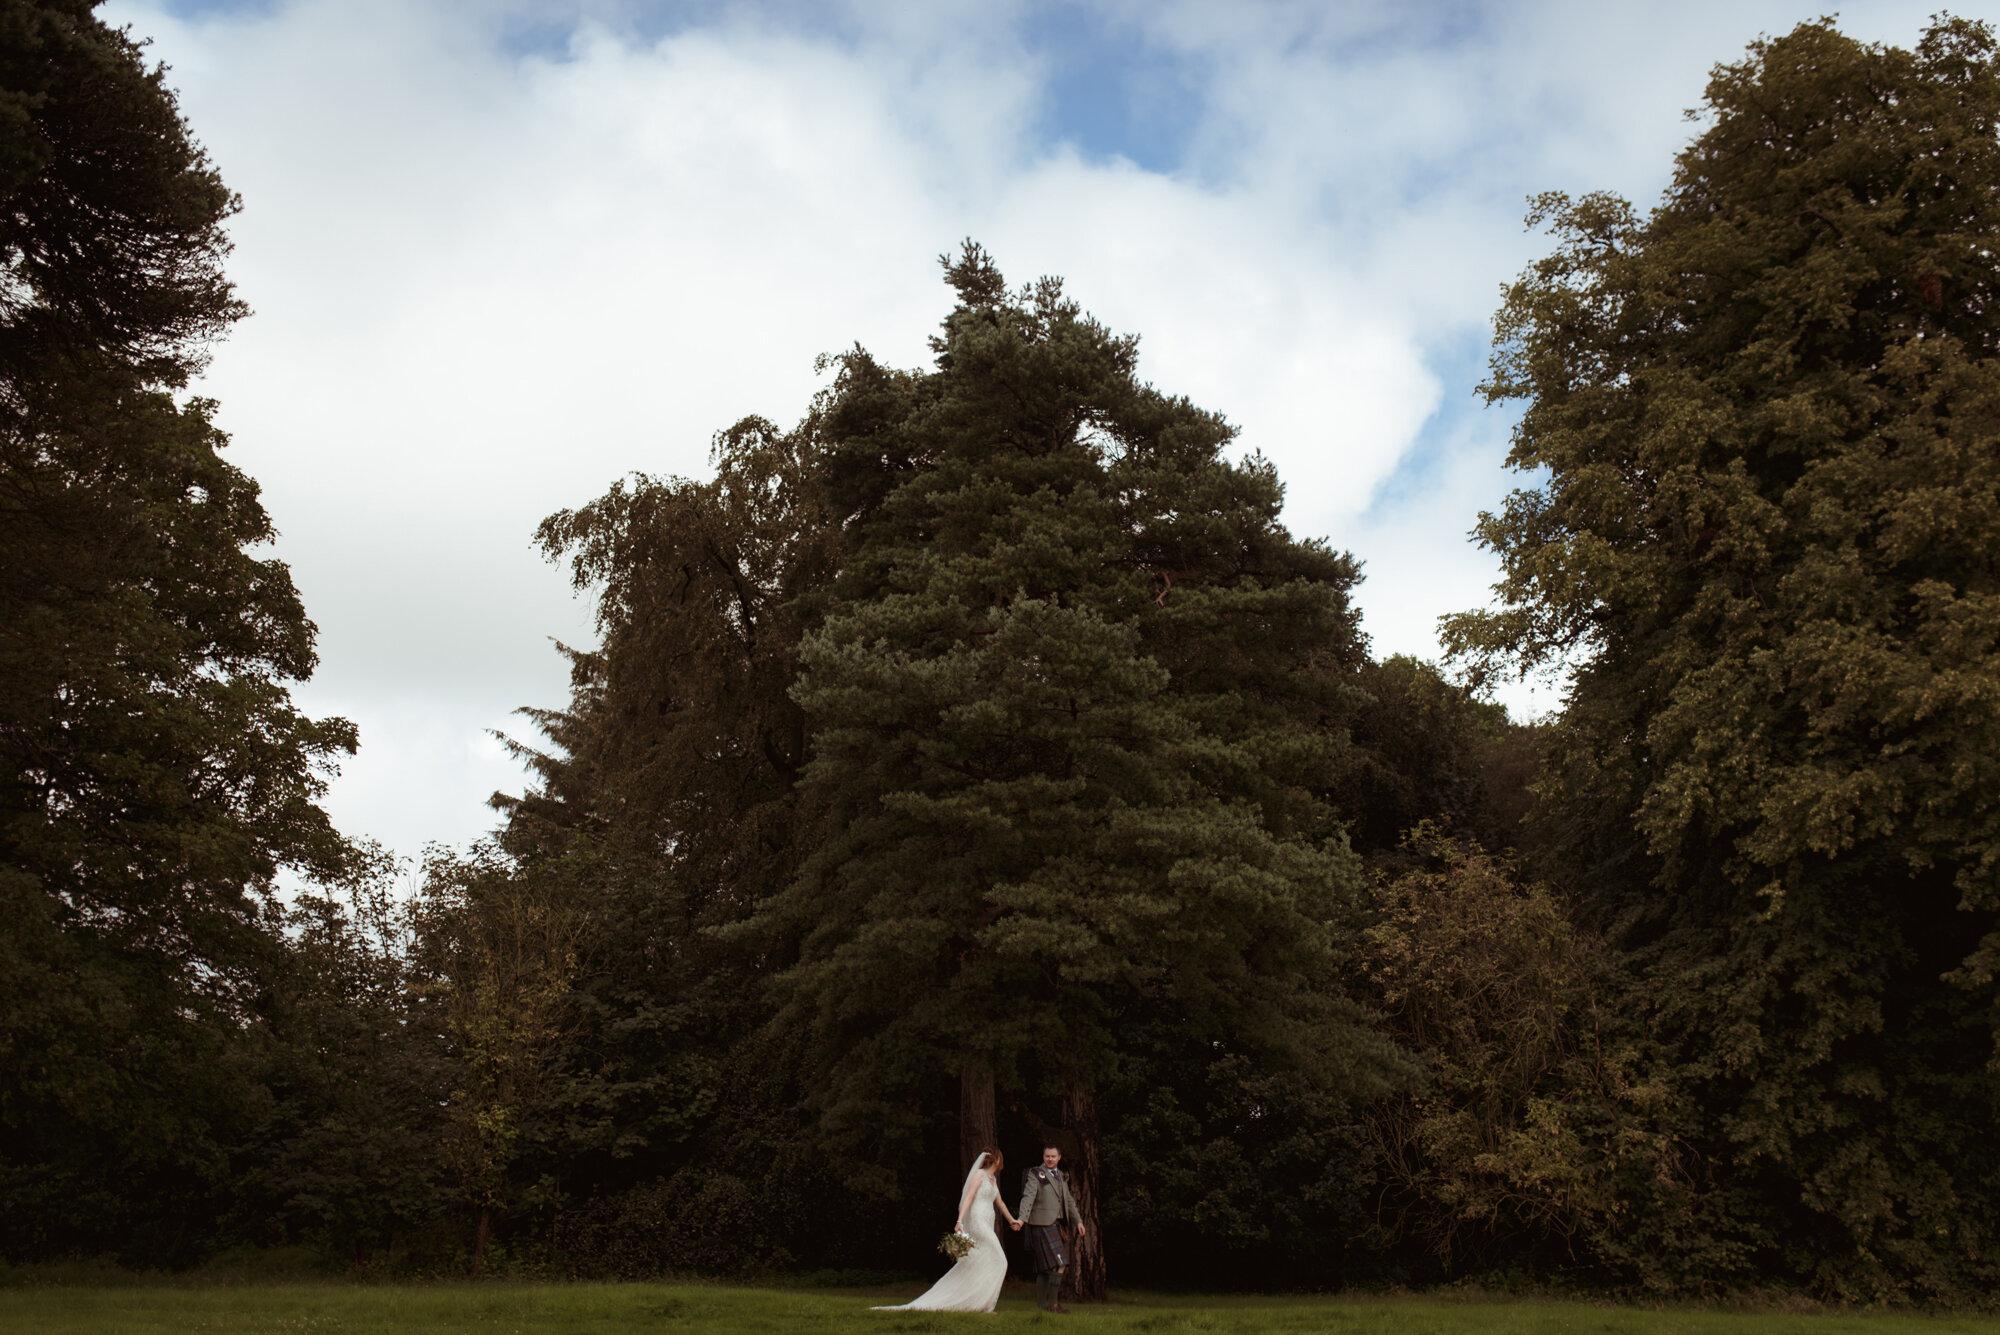 glenbervie-alternative-wedding-photography (4).jpg